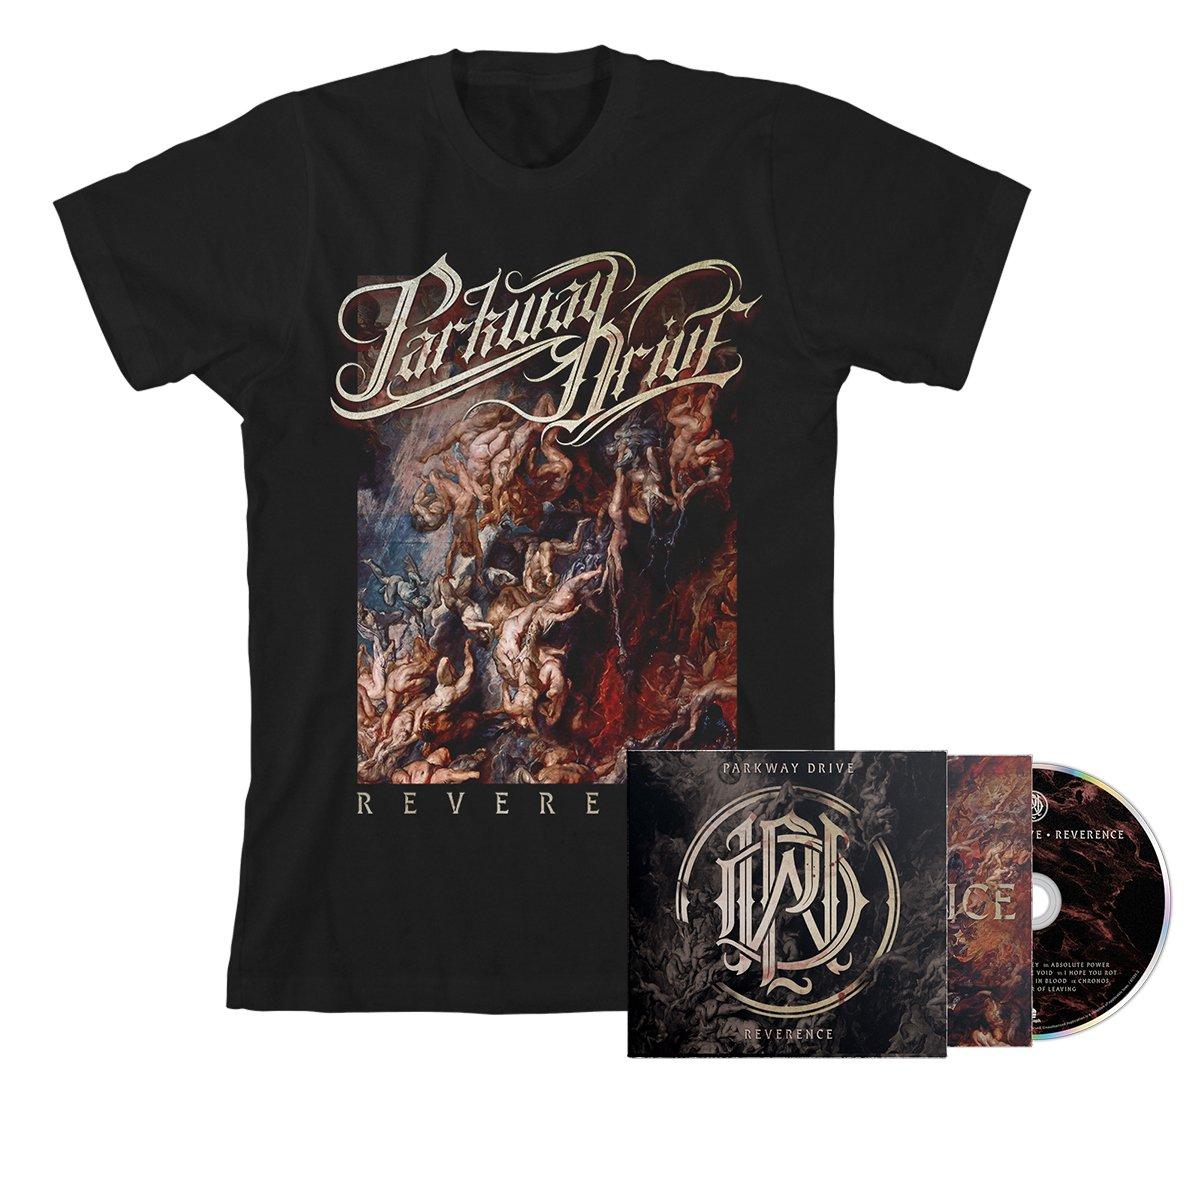 IMAGE | Reverence CD + Album Tee (Black) Bundle